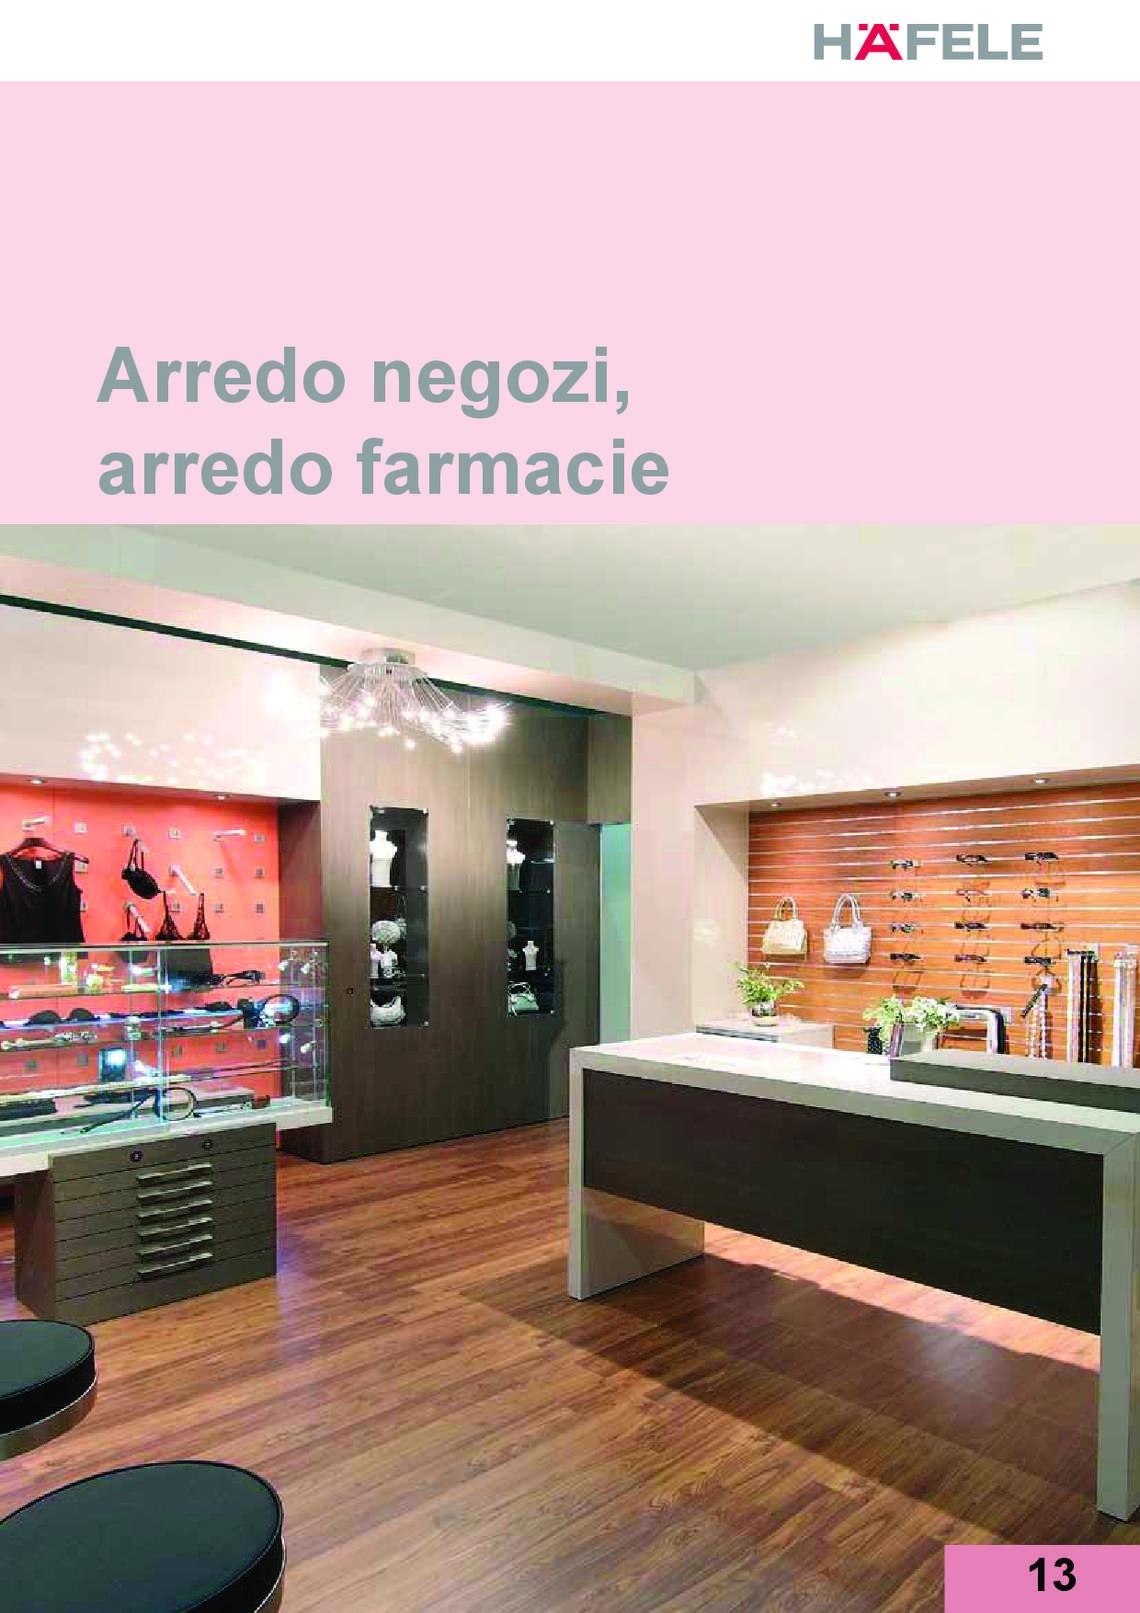 Catalogo hafele arredo negozi e farmacie di h fele italia for Prisma arredo negozi